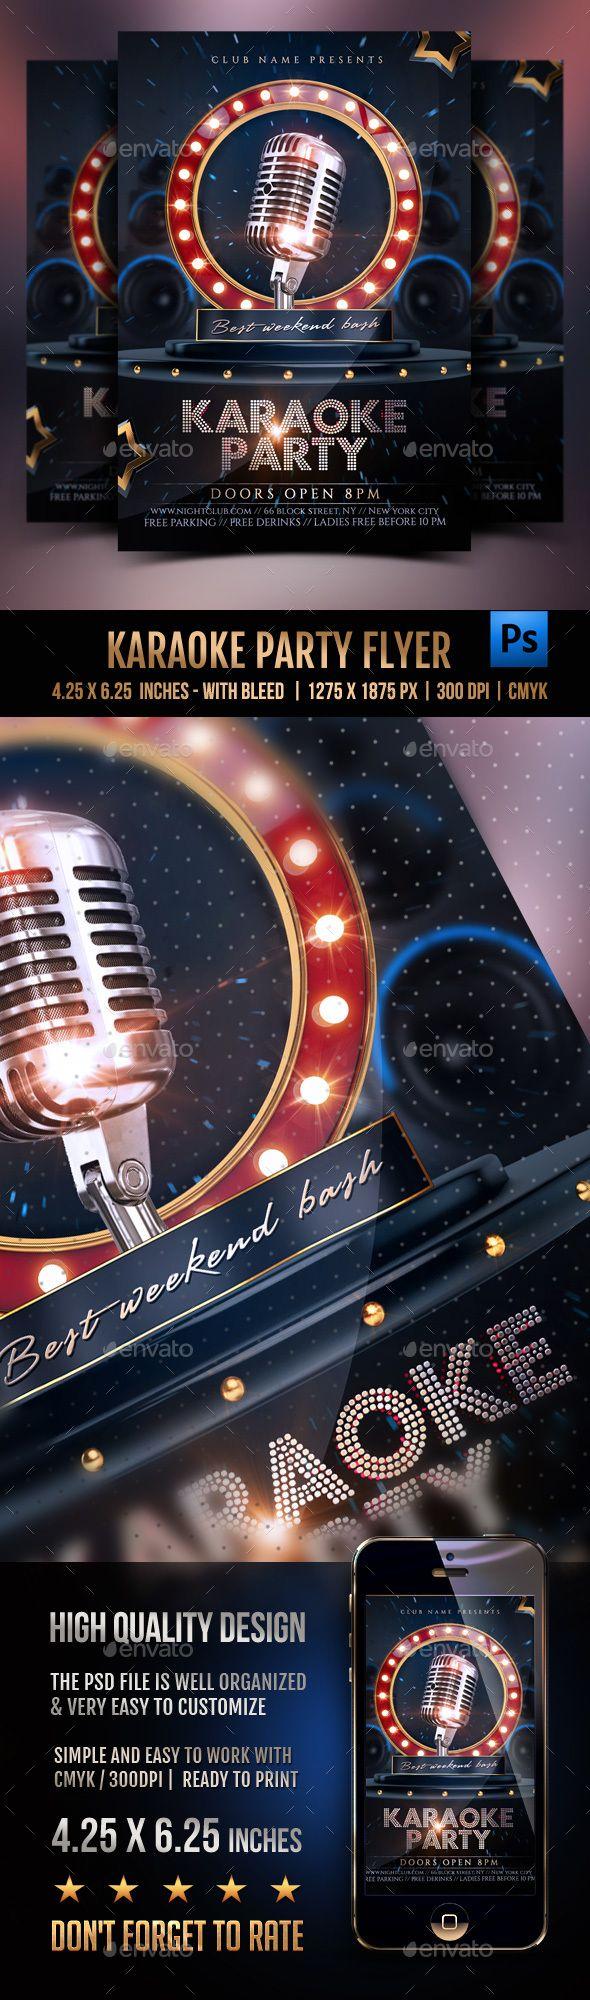 Karaoke Party Flyer Template PSD. Download here: http://graphicriver.net/item/karaoke-party-flyer/16281788?ref=ksioks